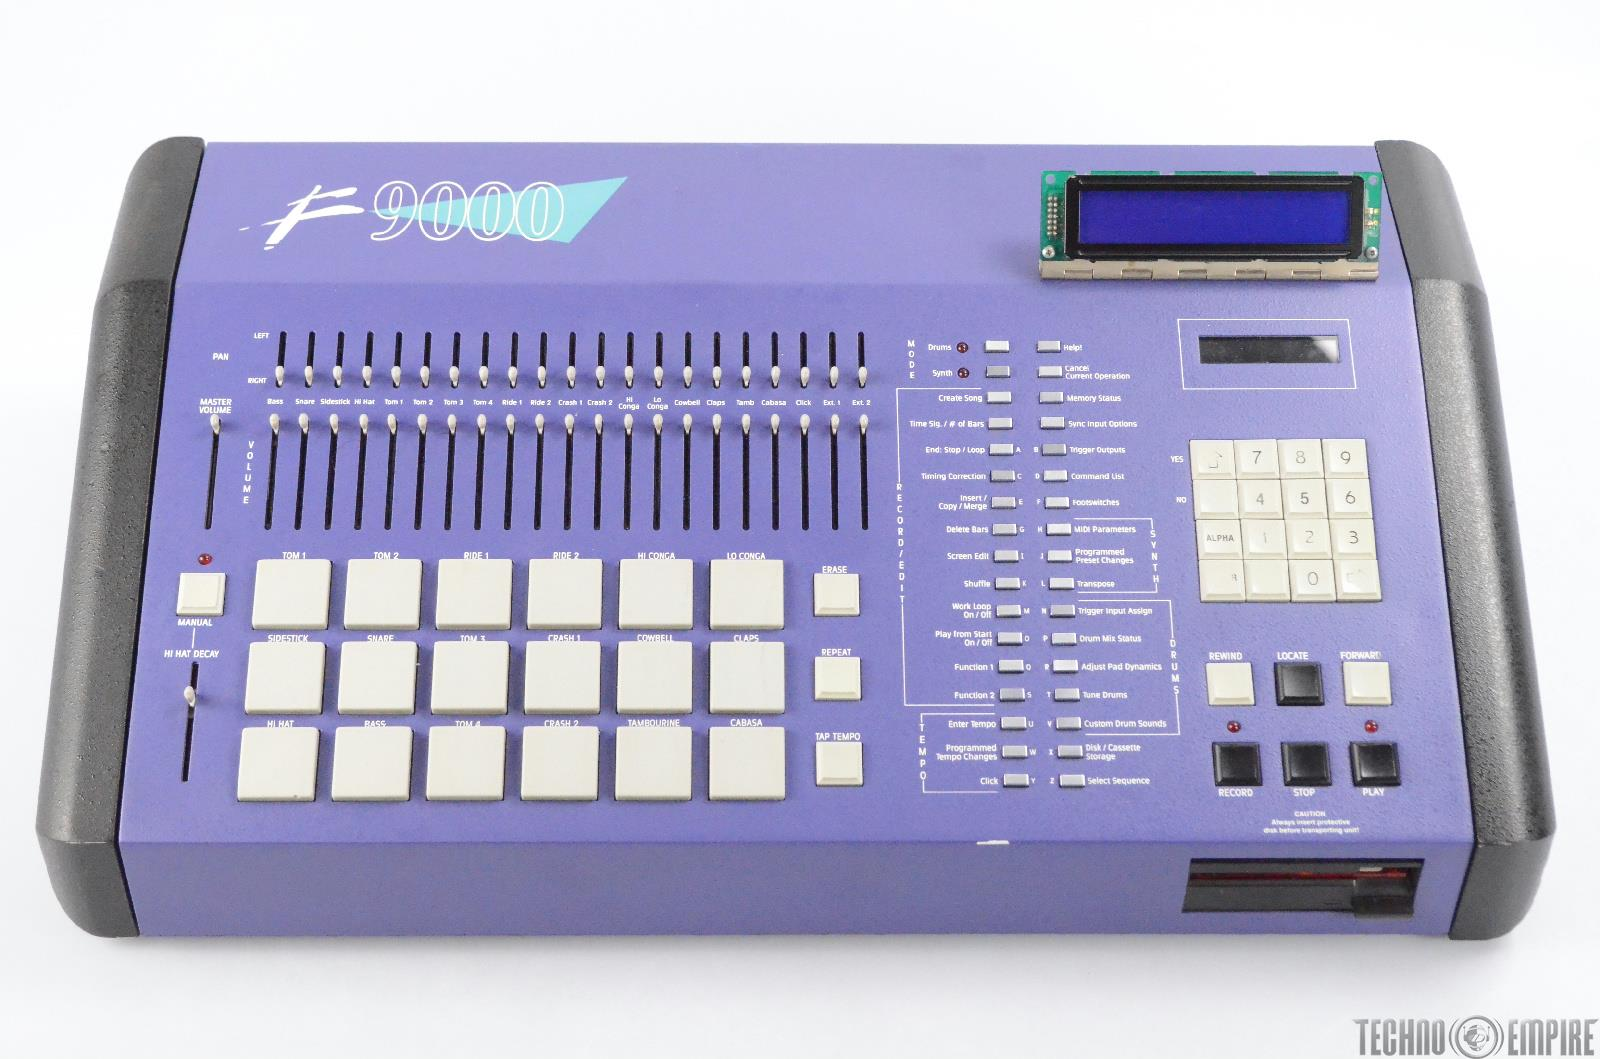 Forat F9000 Drum Machine Rev 7.09 Custom Modified & Hot Rodded Linn 9000 #30813